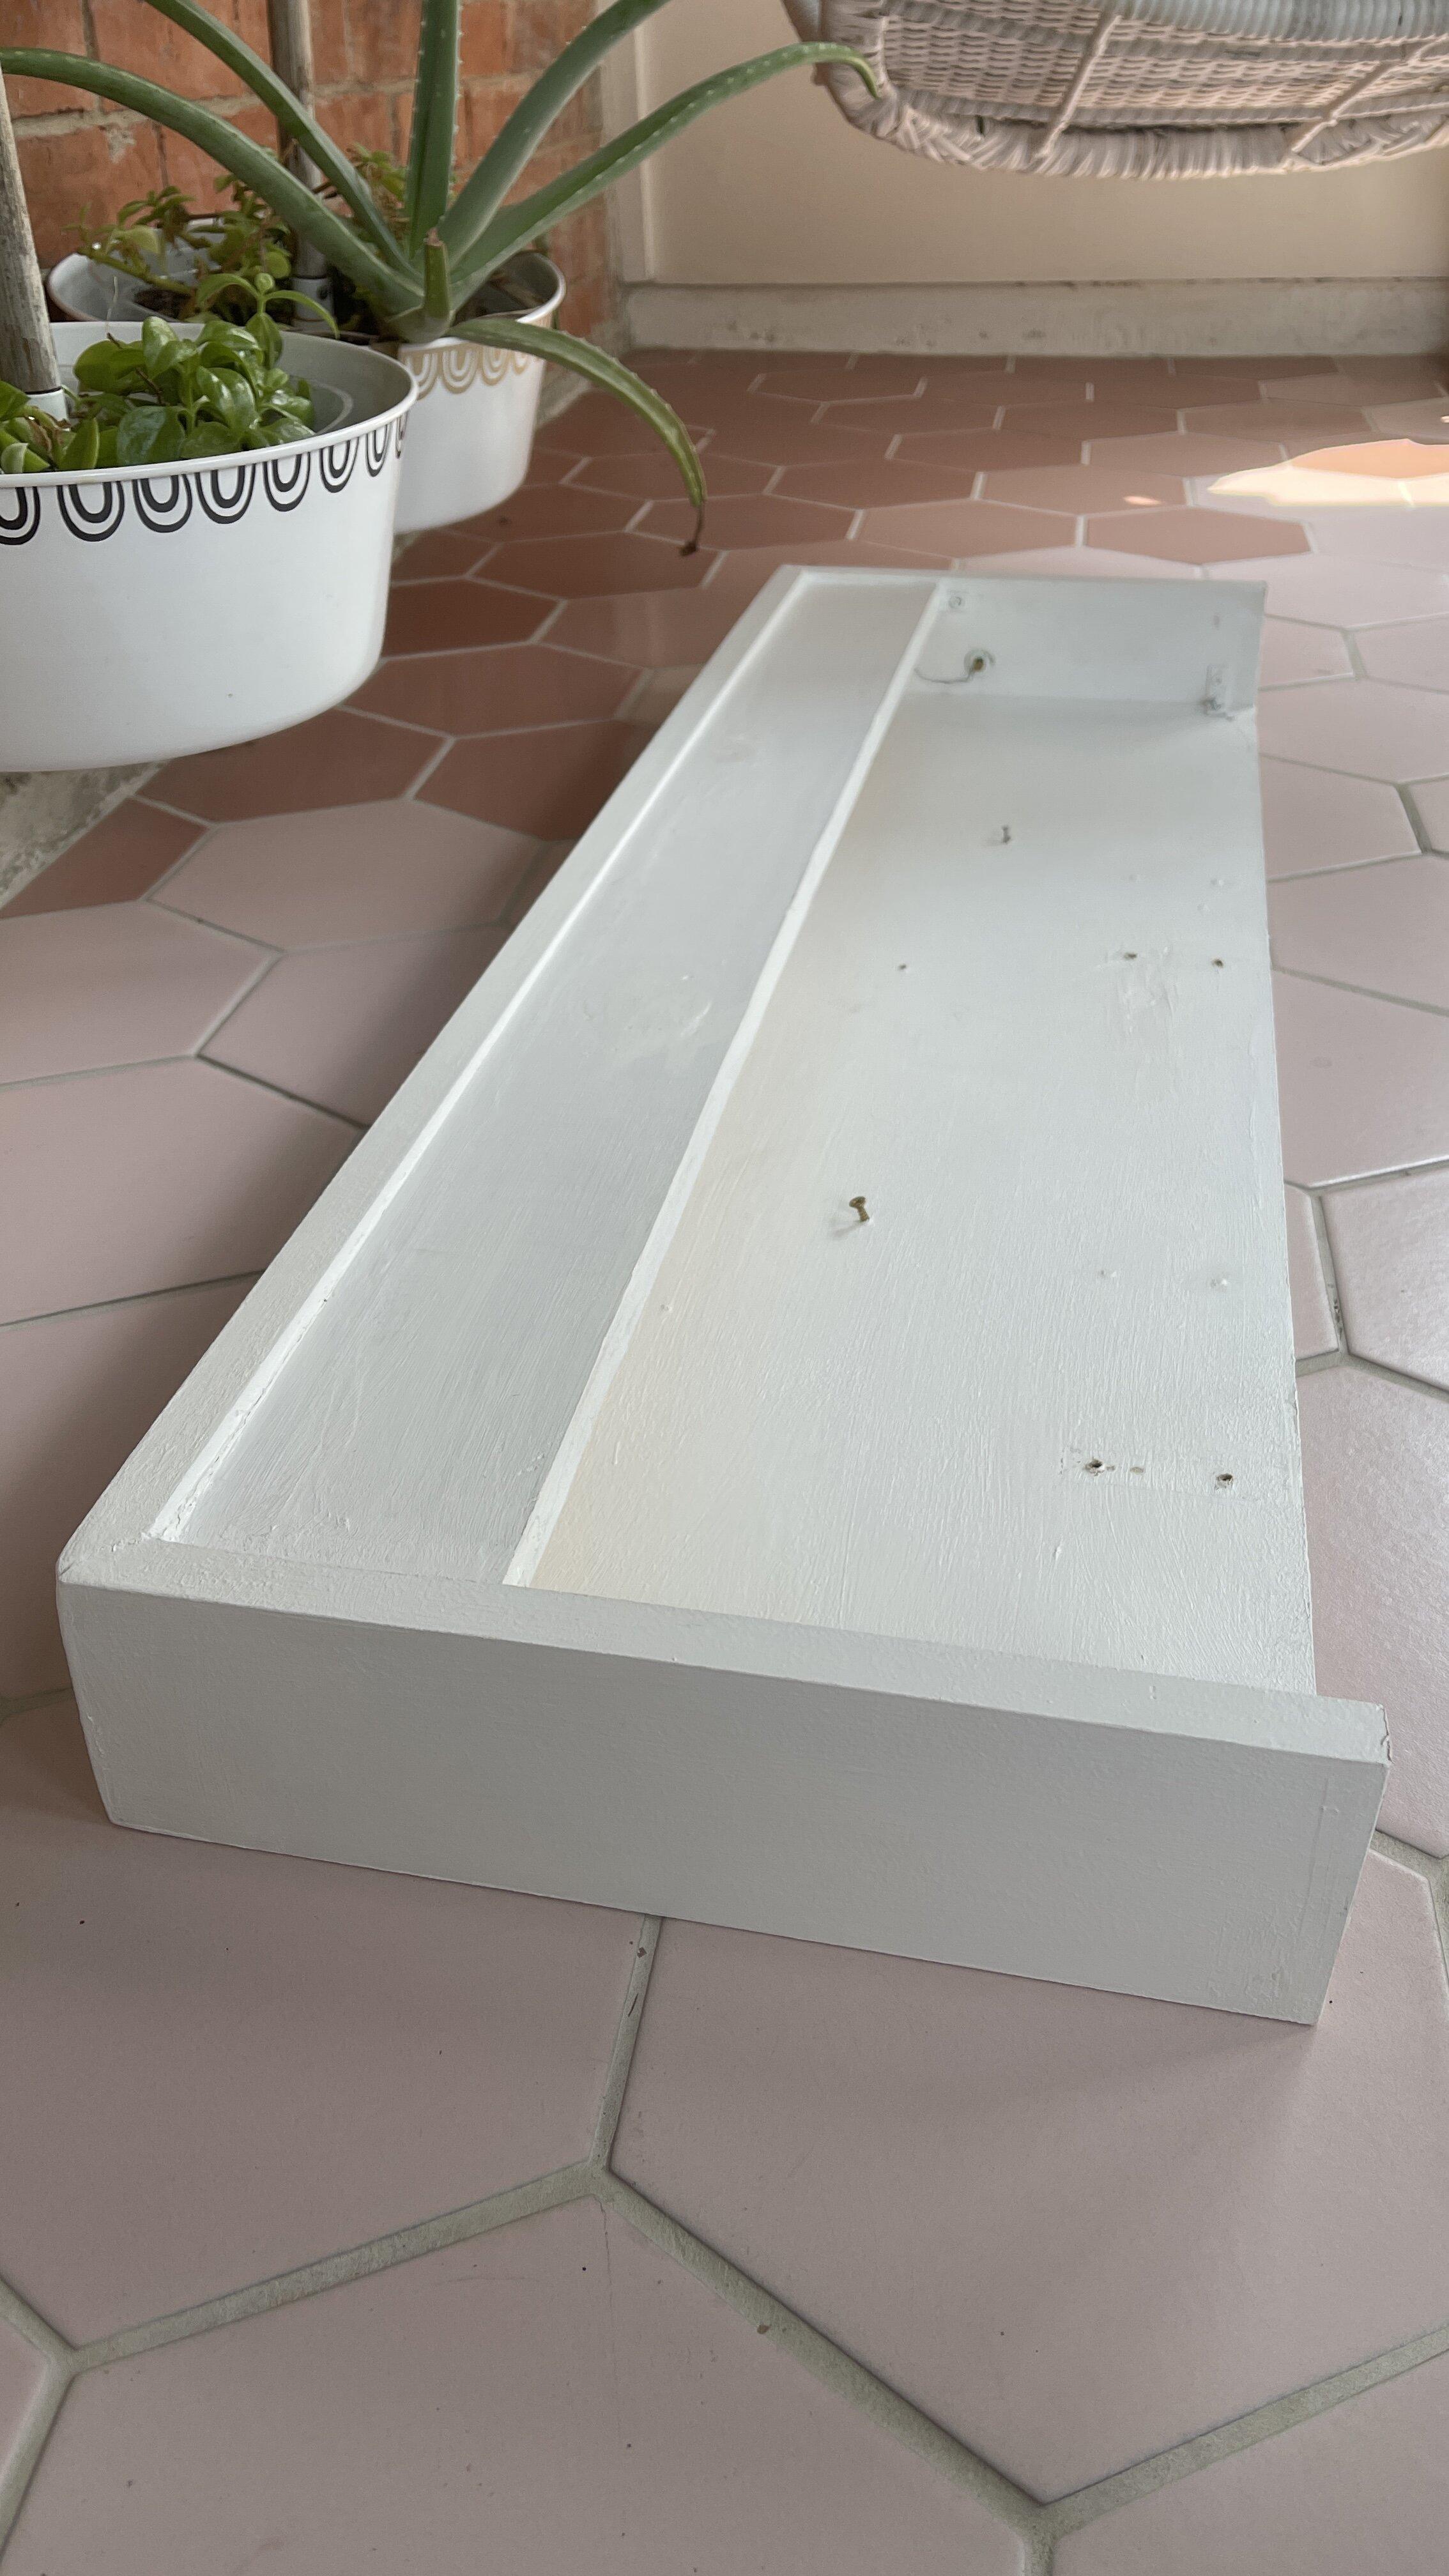 DIY TV Cover Shelf Build Detail 9.JPG